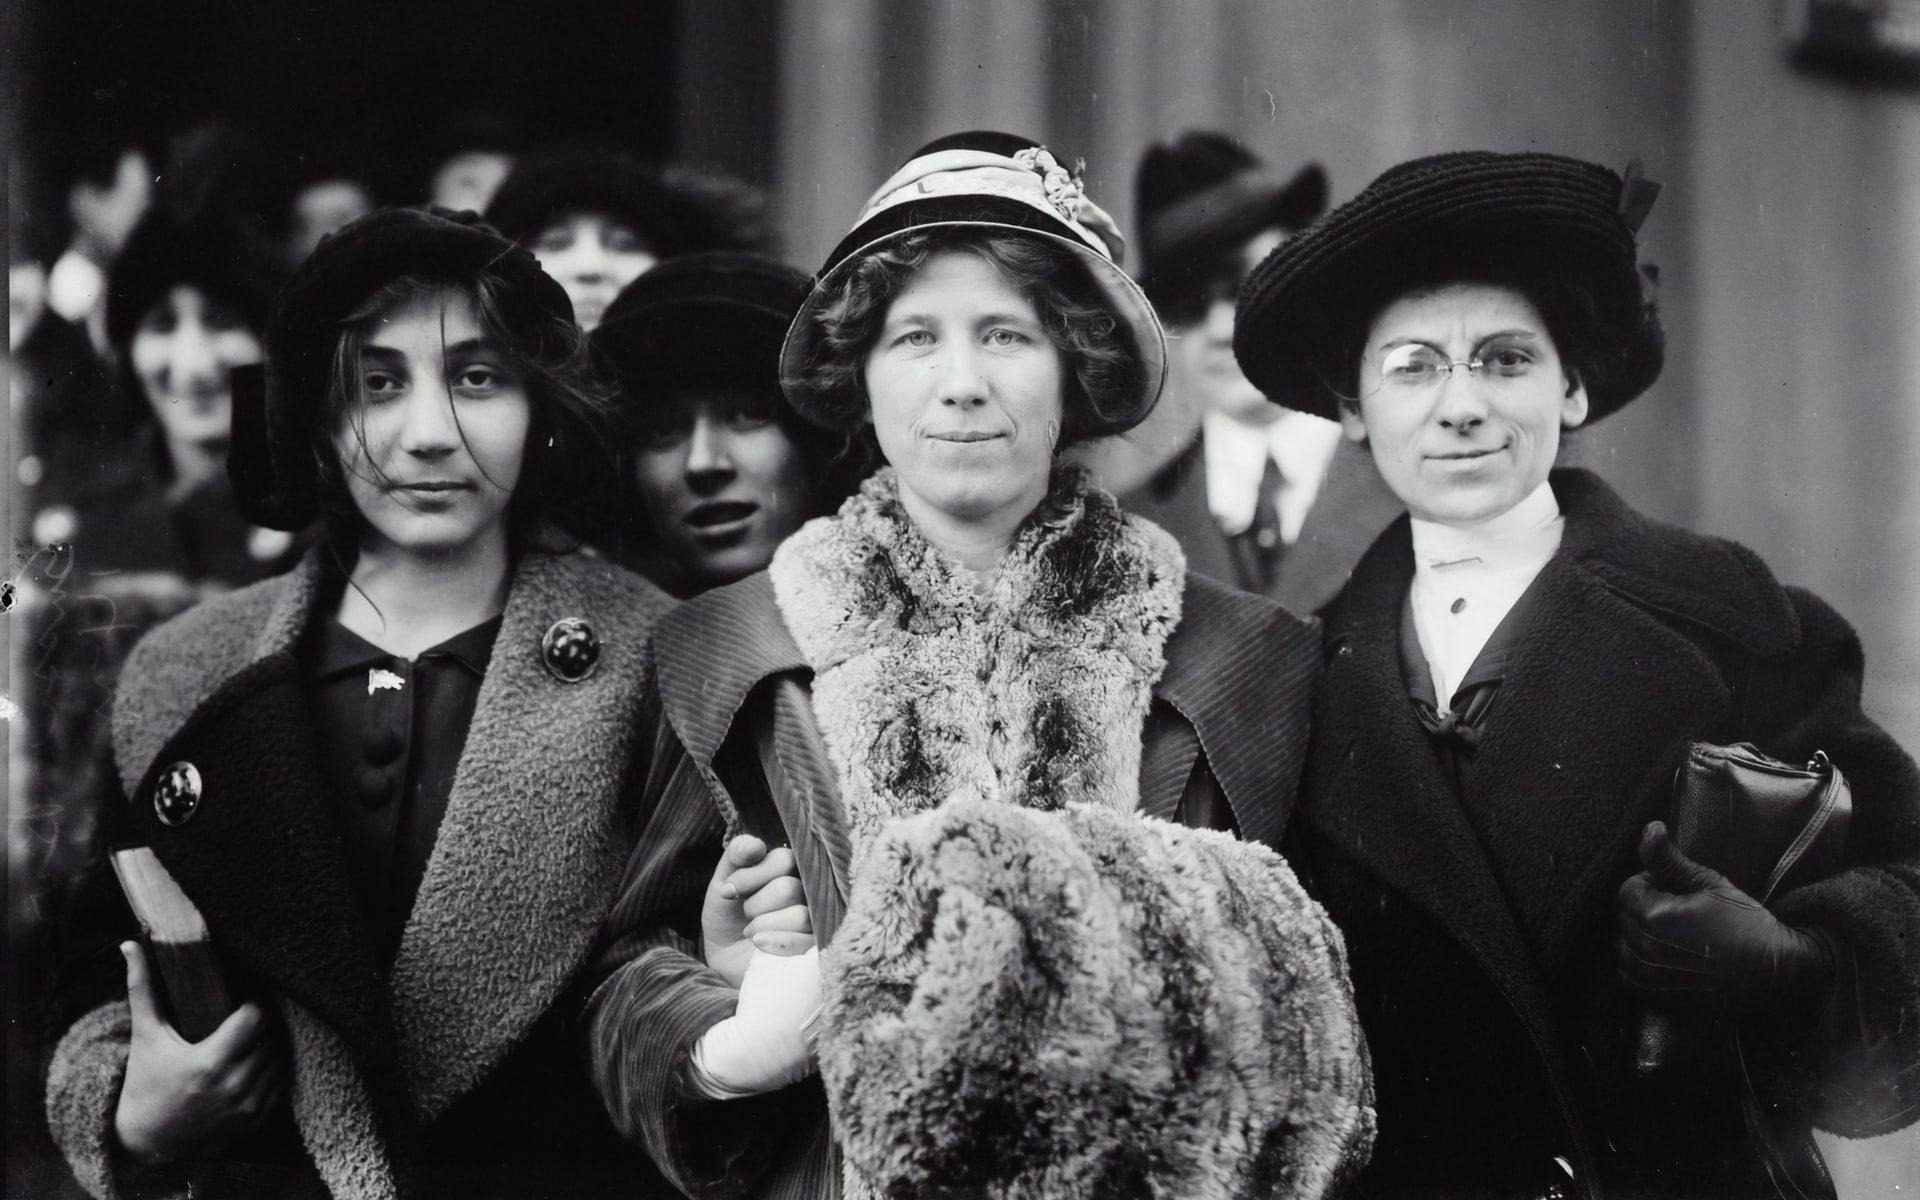 Suffrage Movement